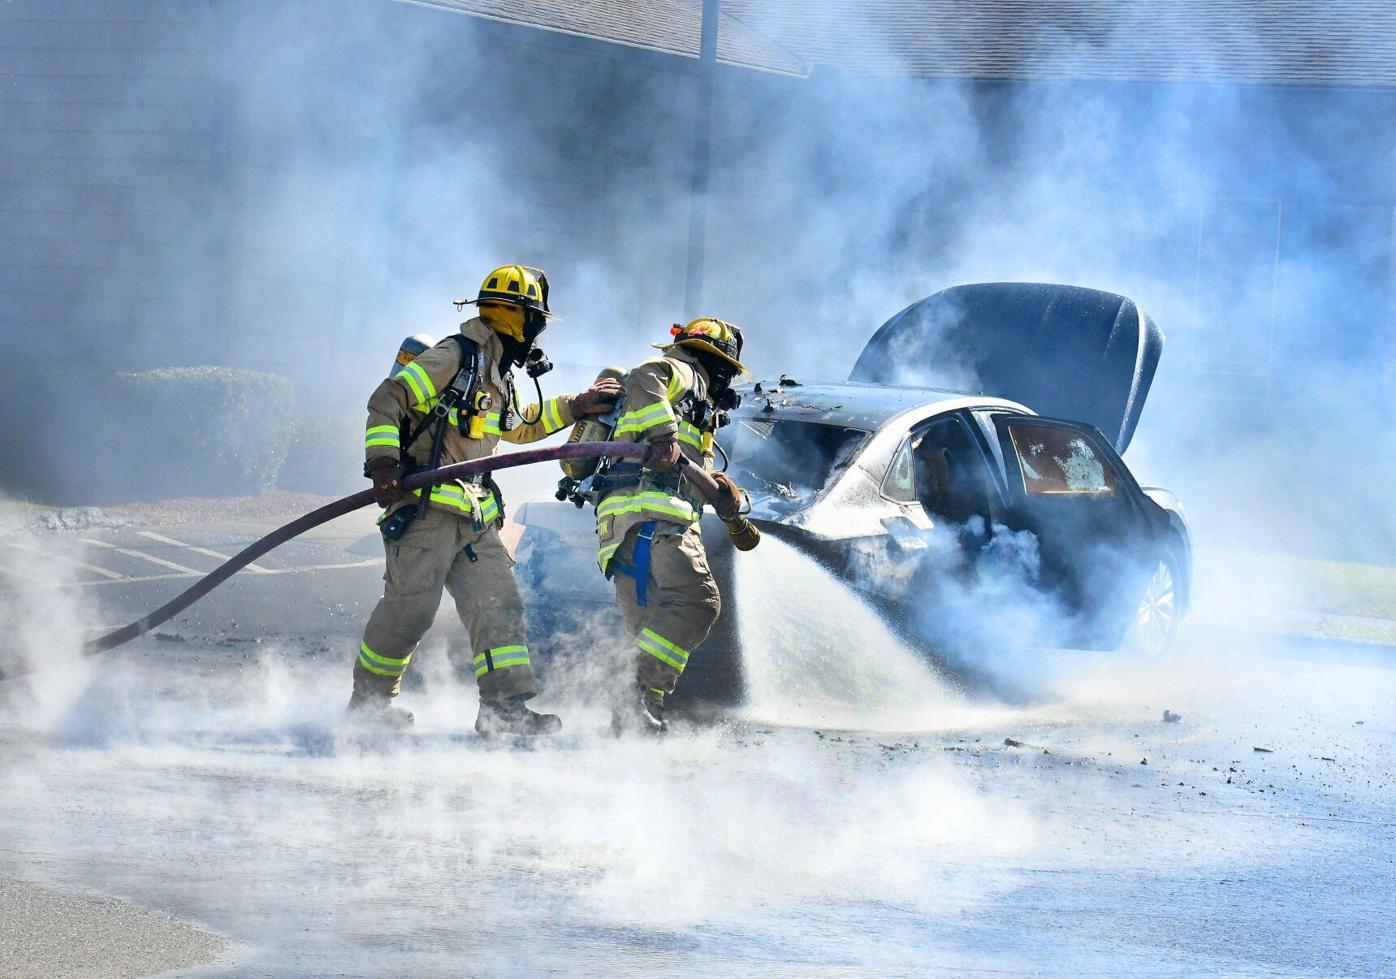 033021 SW Car Fire 01 BEST.jpg